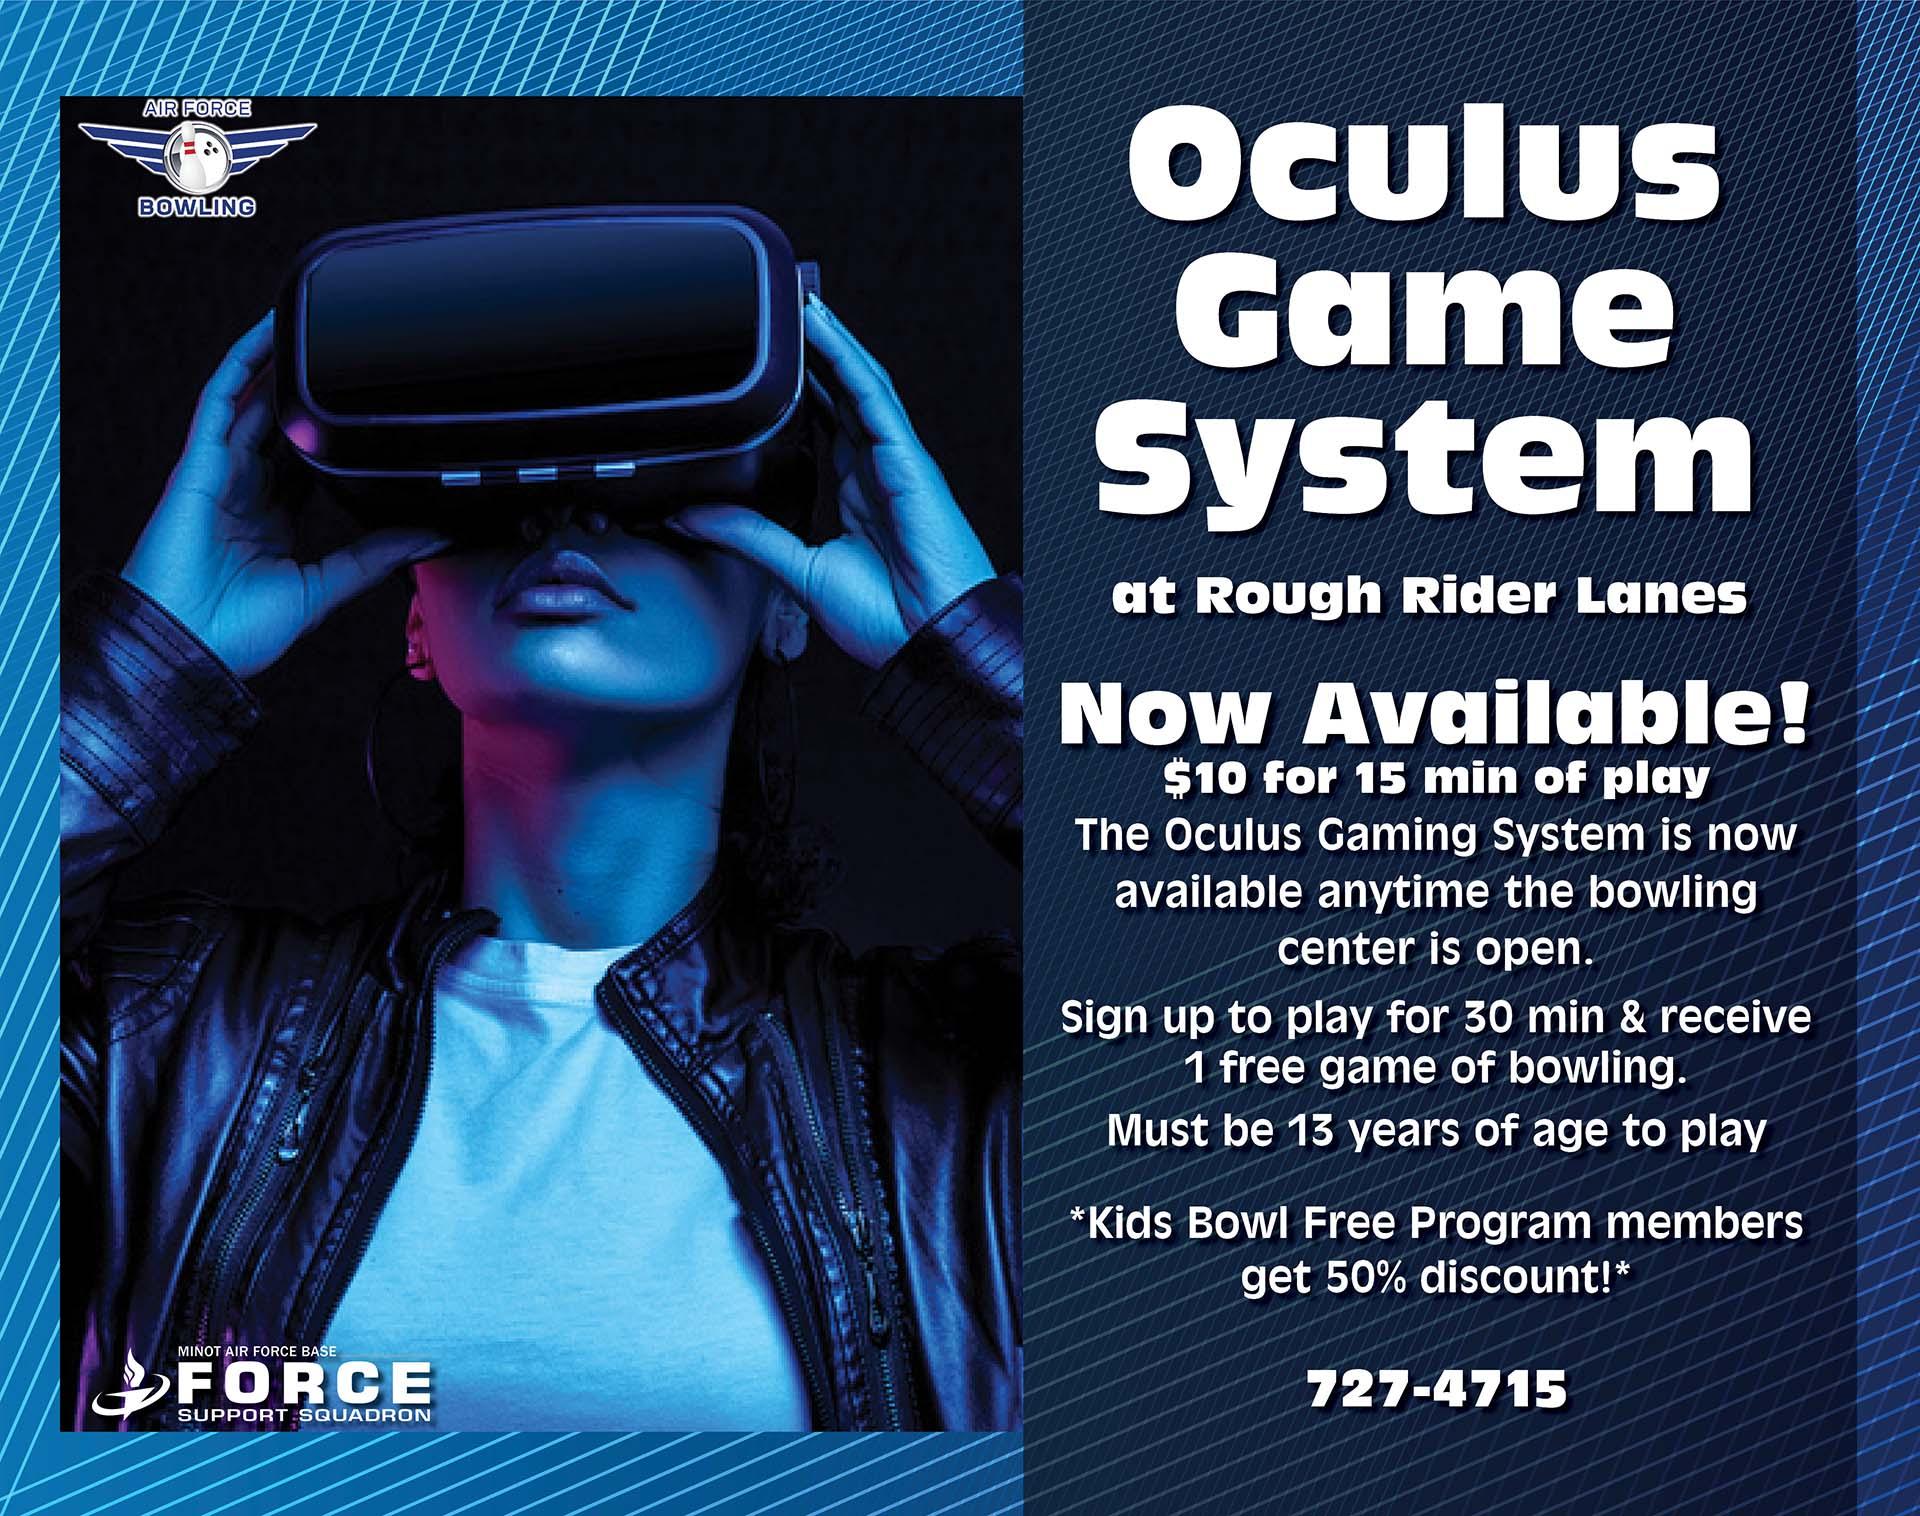 Oculus Game System - Apr 21 (1)